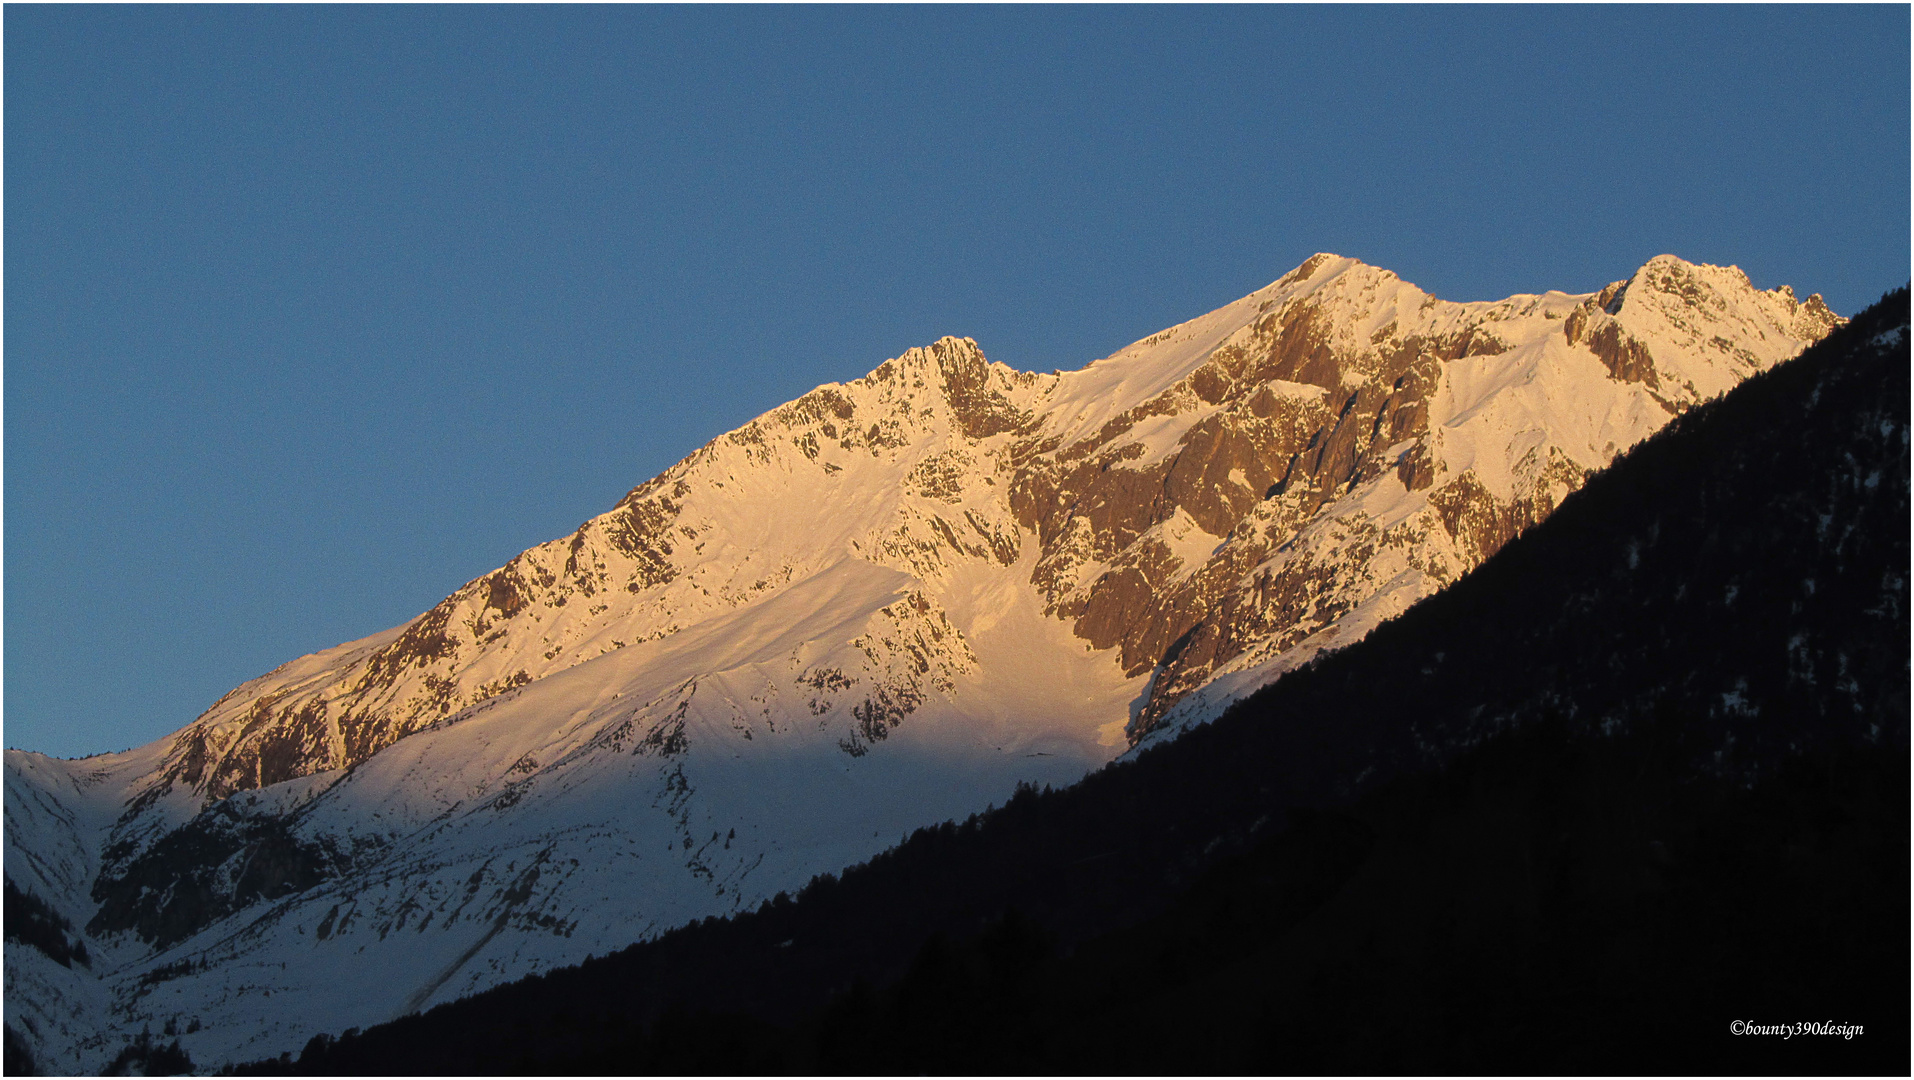 Morgensonne auf dem Dawinkopf